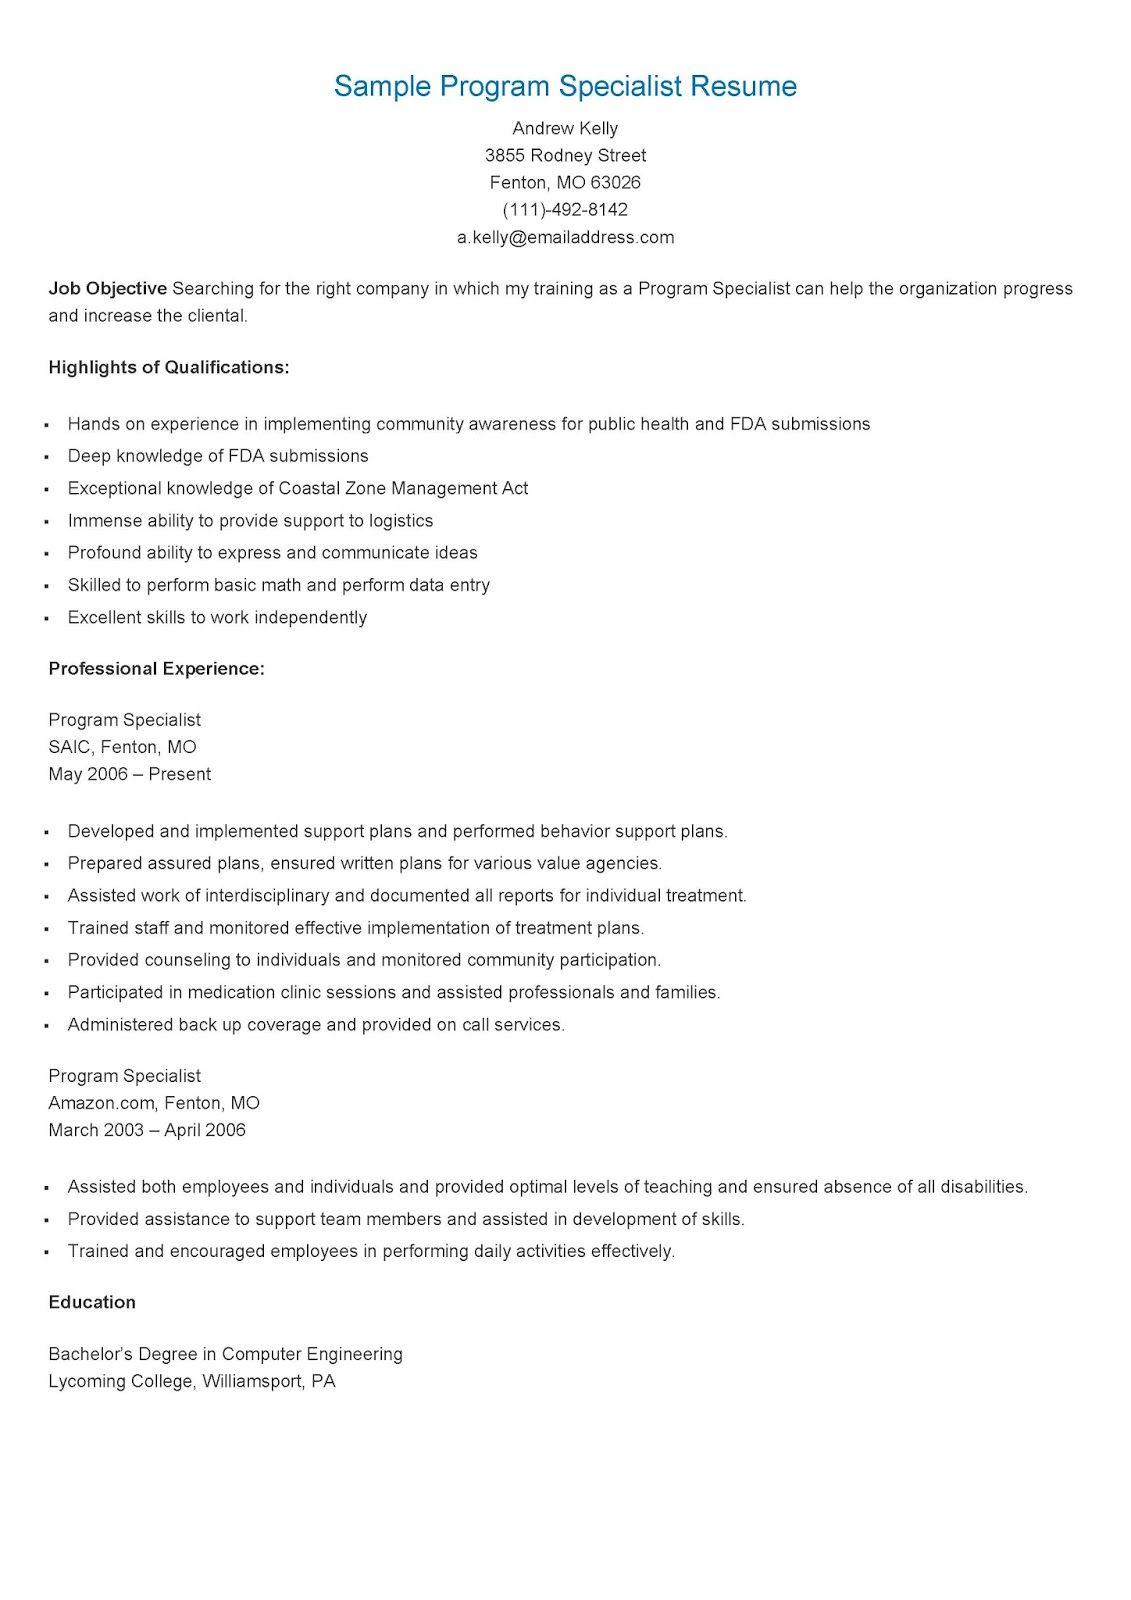 Sample Program Specialist Resume   resame   Pinterest